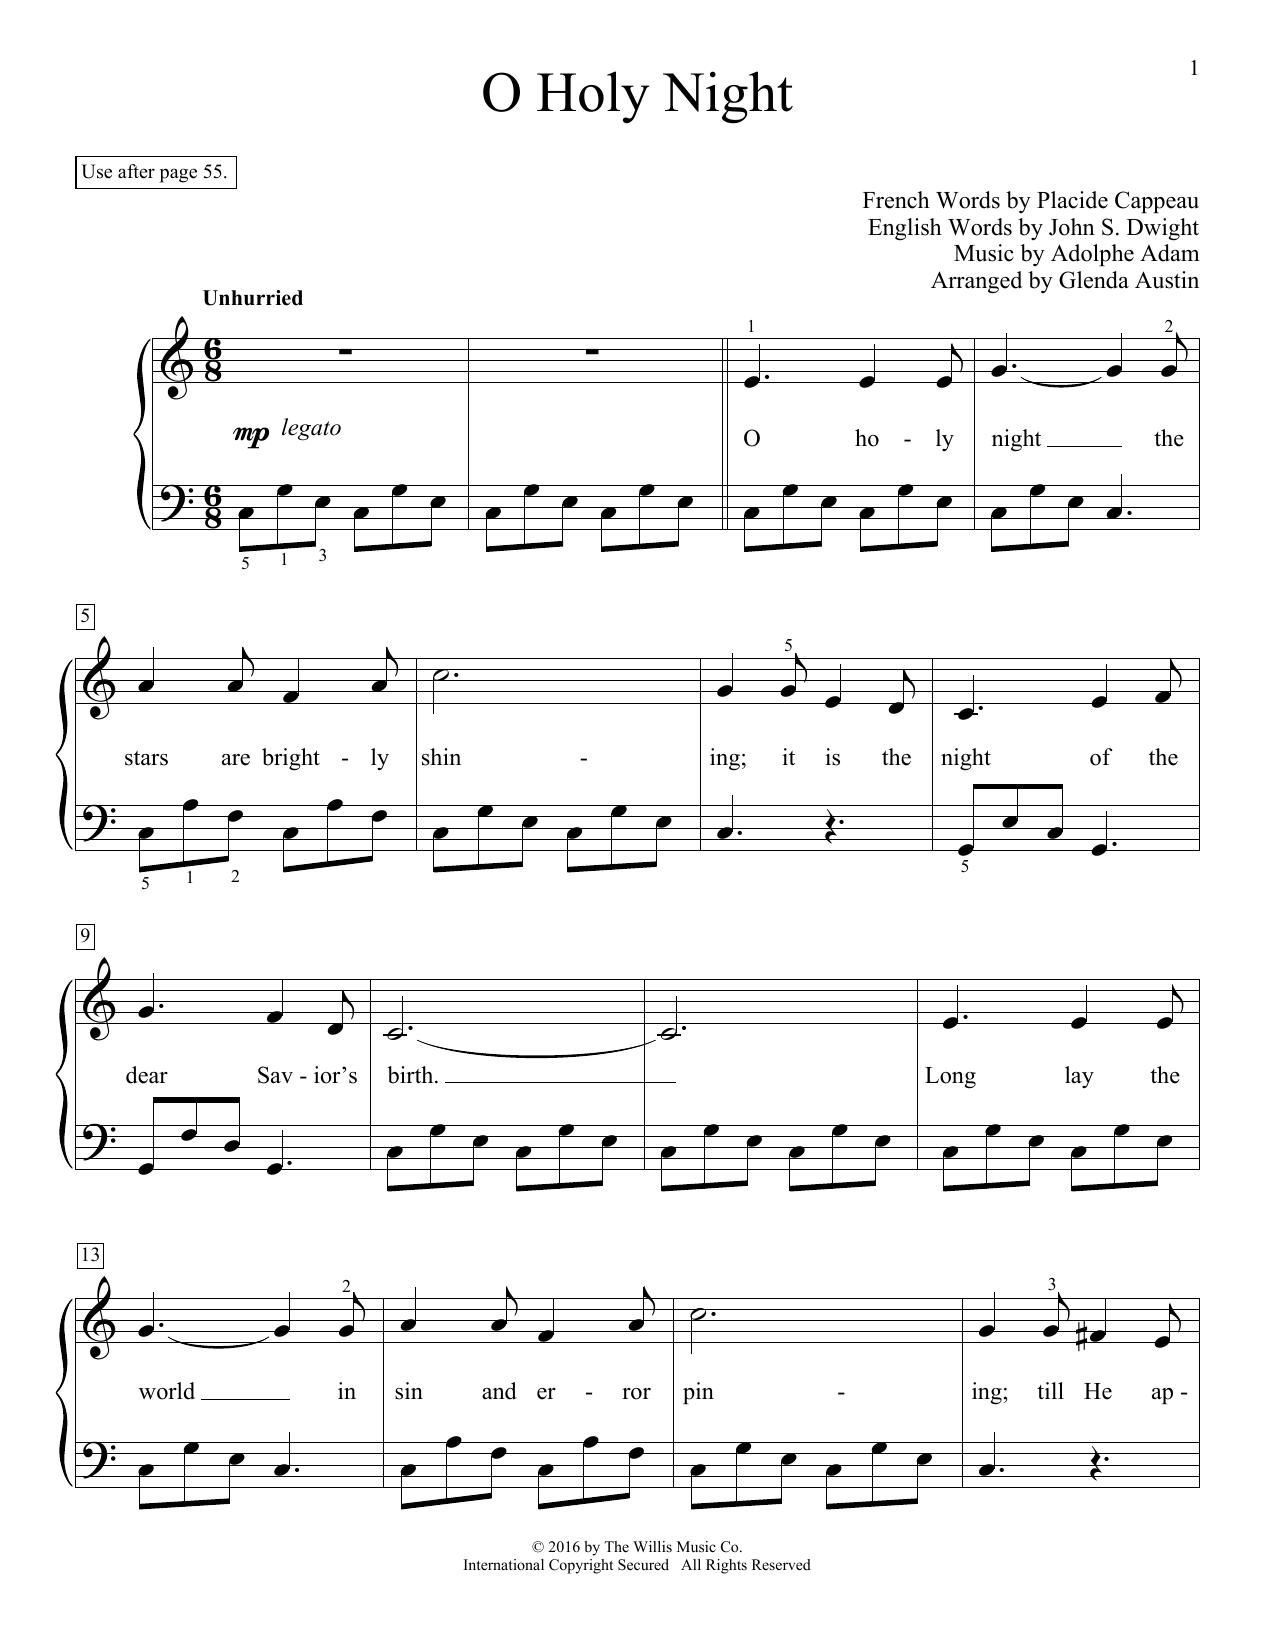 image regarding Printable Hymns Sheet Music known as Glenda Austin O Holy Night time Sheet Songs Notes, Chords Down load Printable Enlightening Piano - SKU: 172156